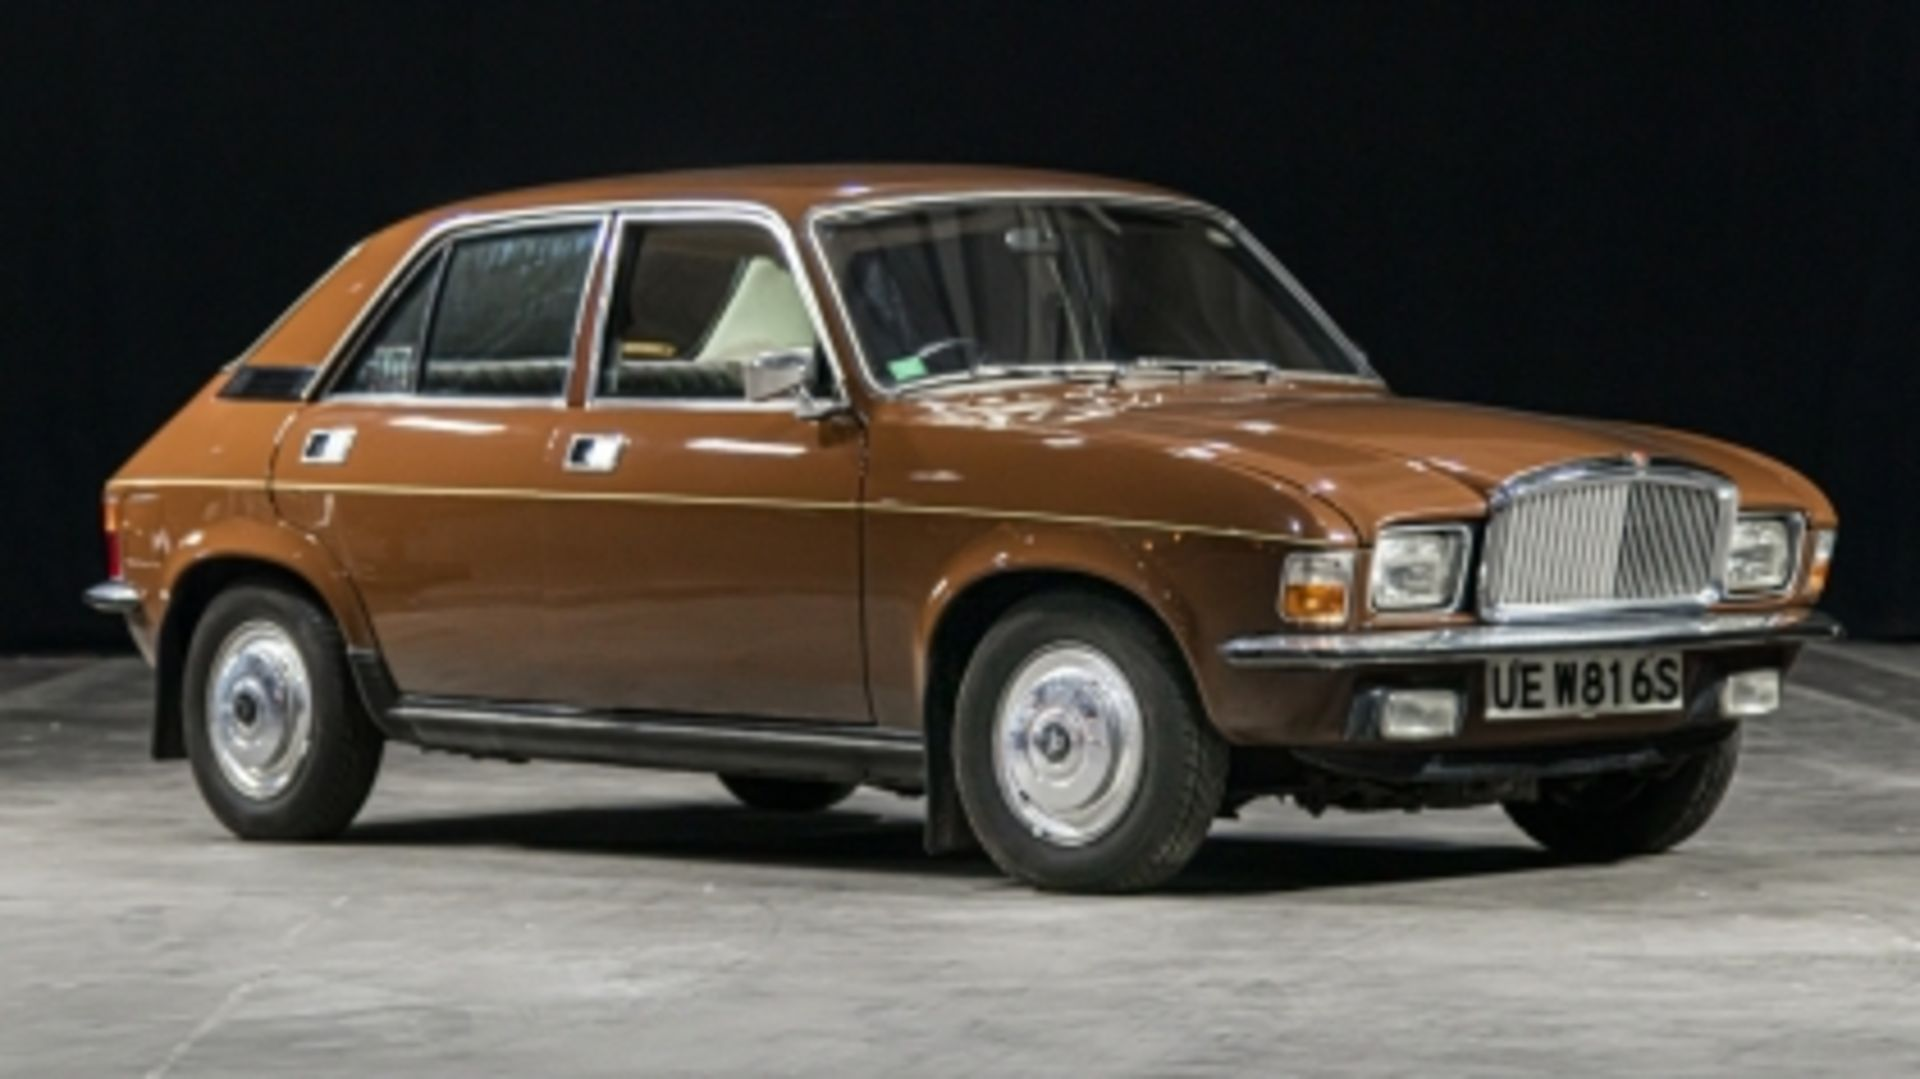 Lot 567 - 1978 Austin Allegro Vanden Plas 1500